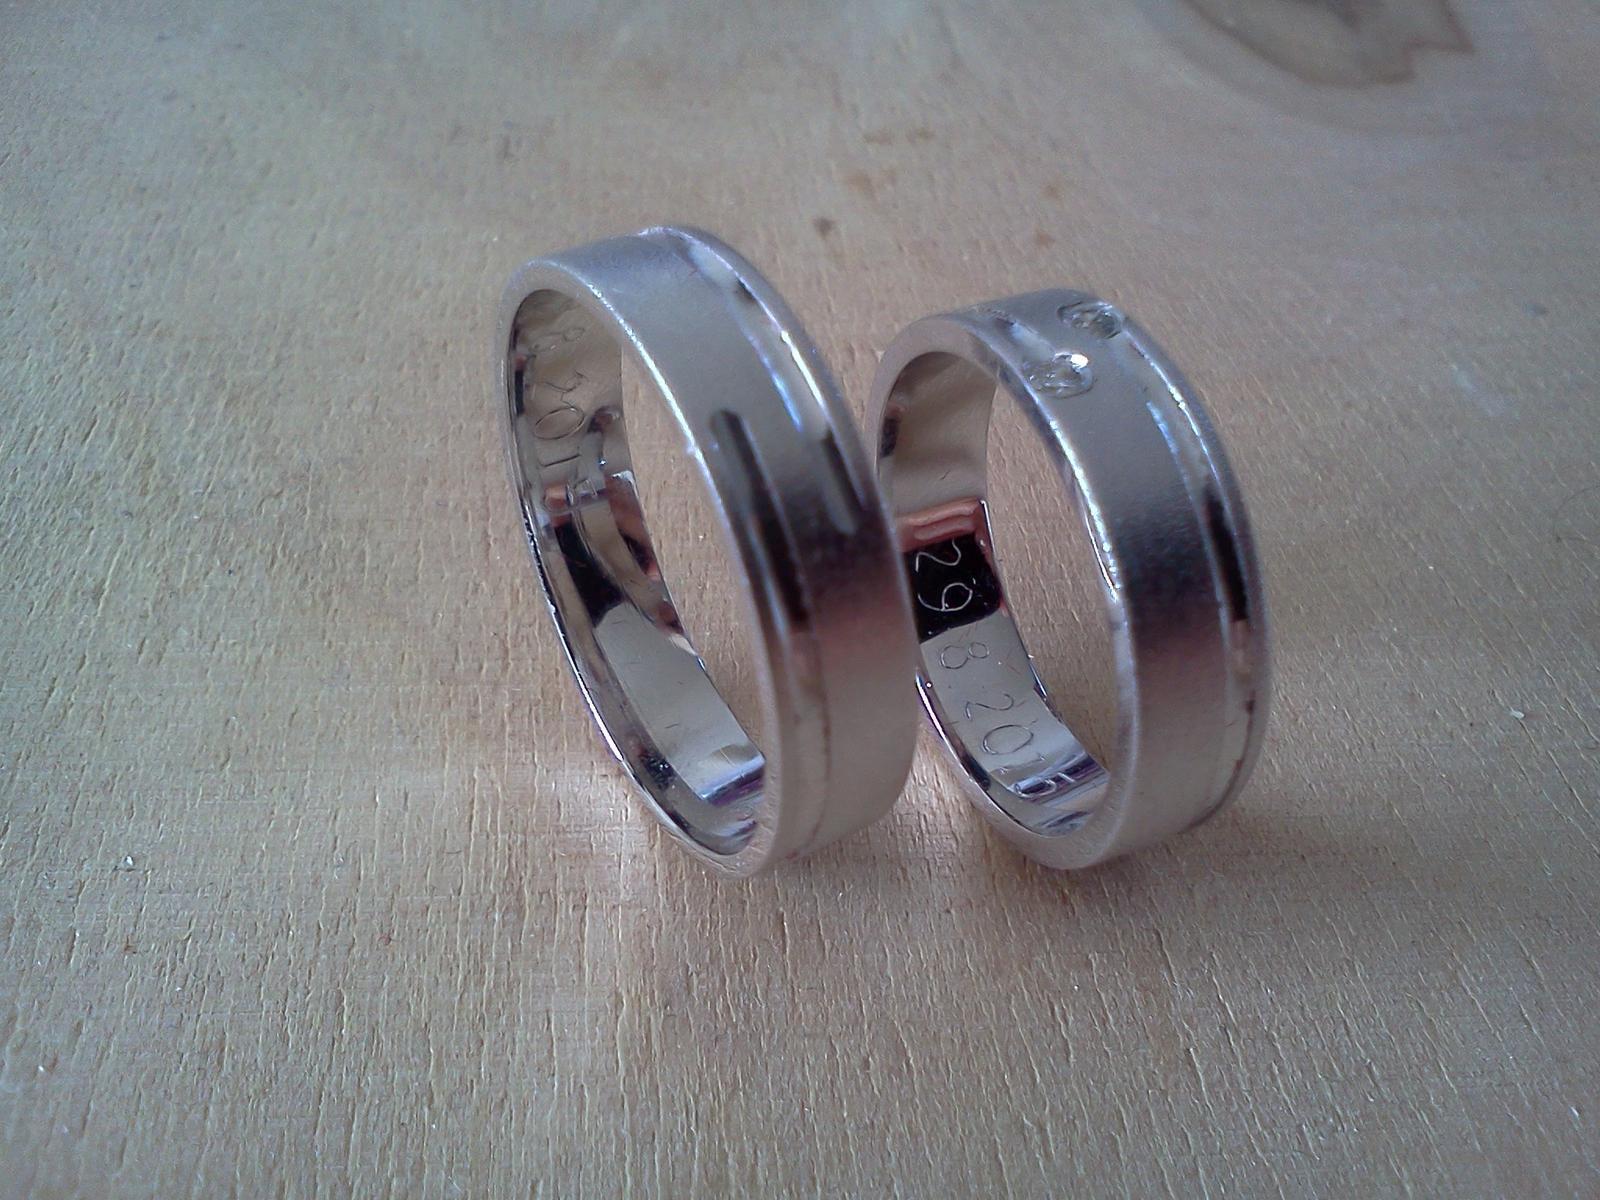 Snubni Prsteny 5 000 Kc Svatebni Bazar Beremese Cz